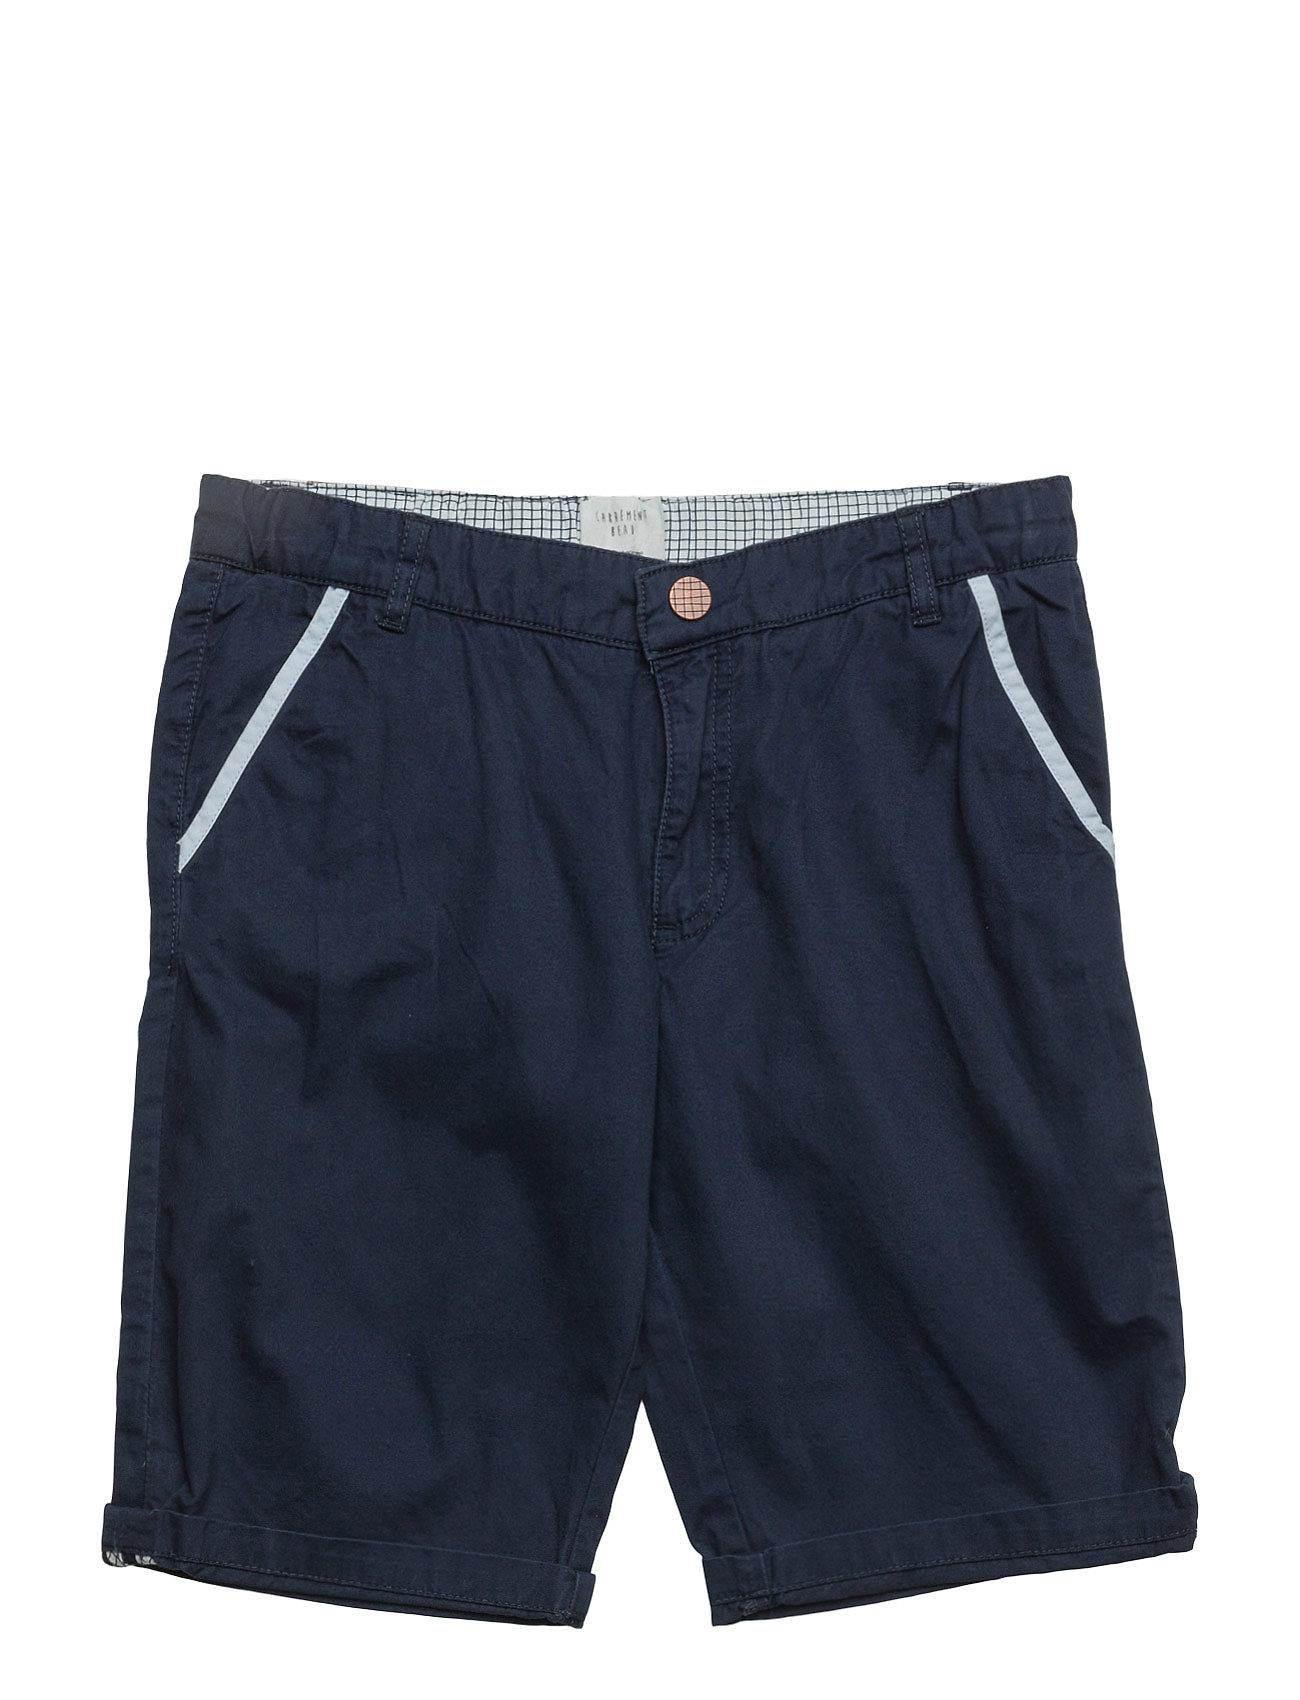 Bermuda shorts fra carrã©ment beau på boozt.com dk